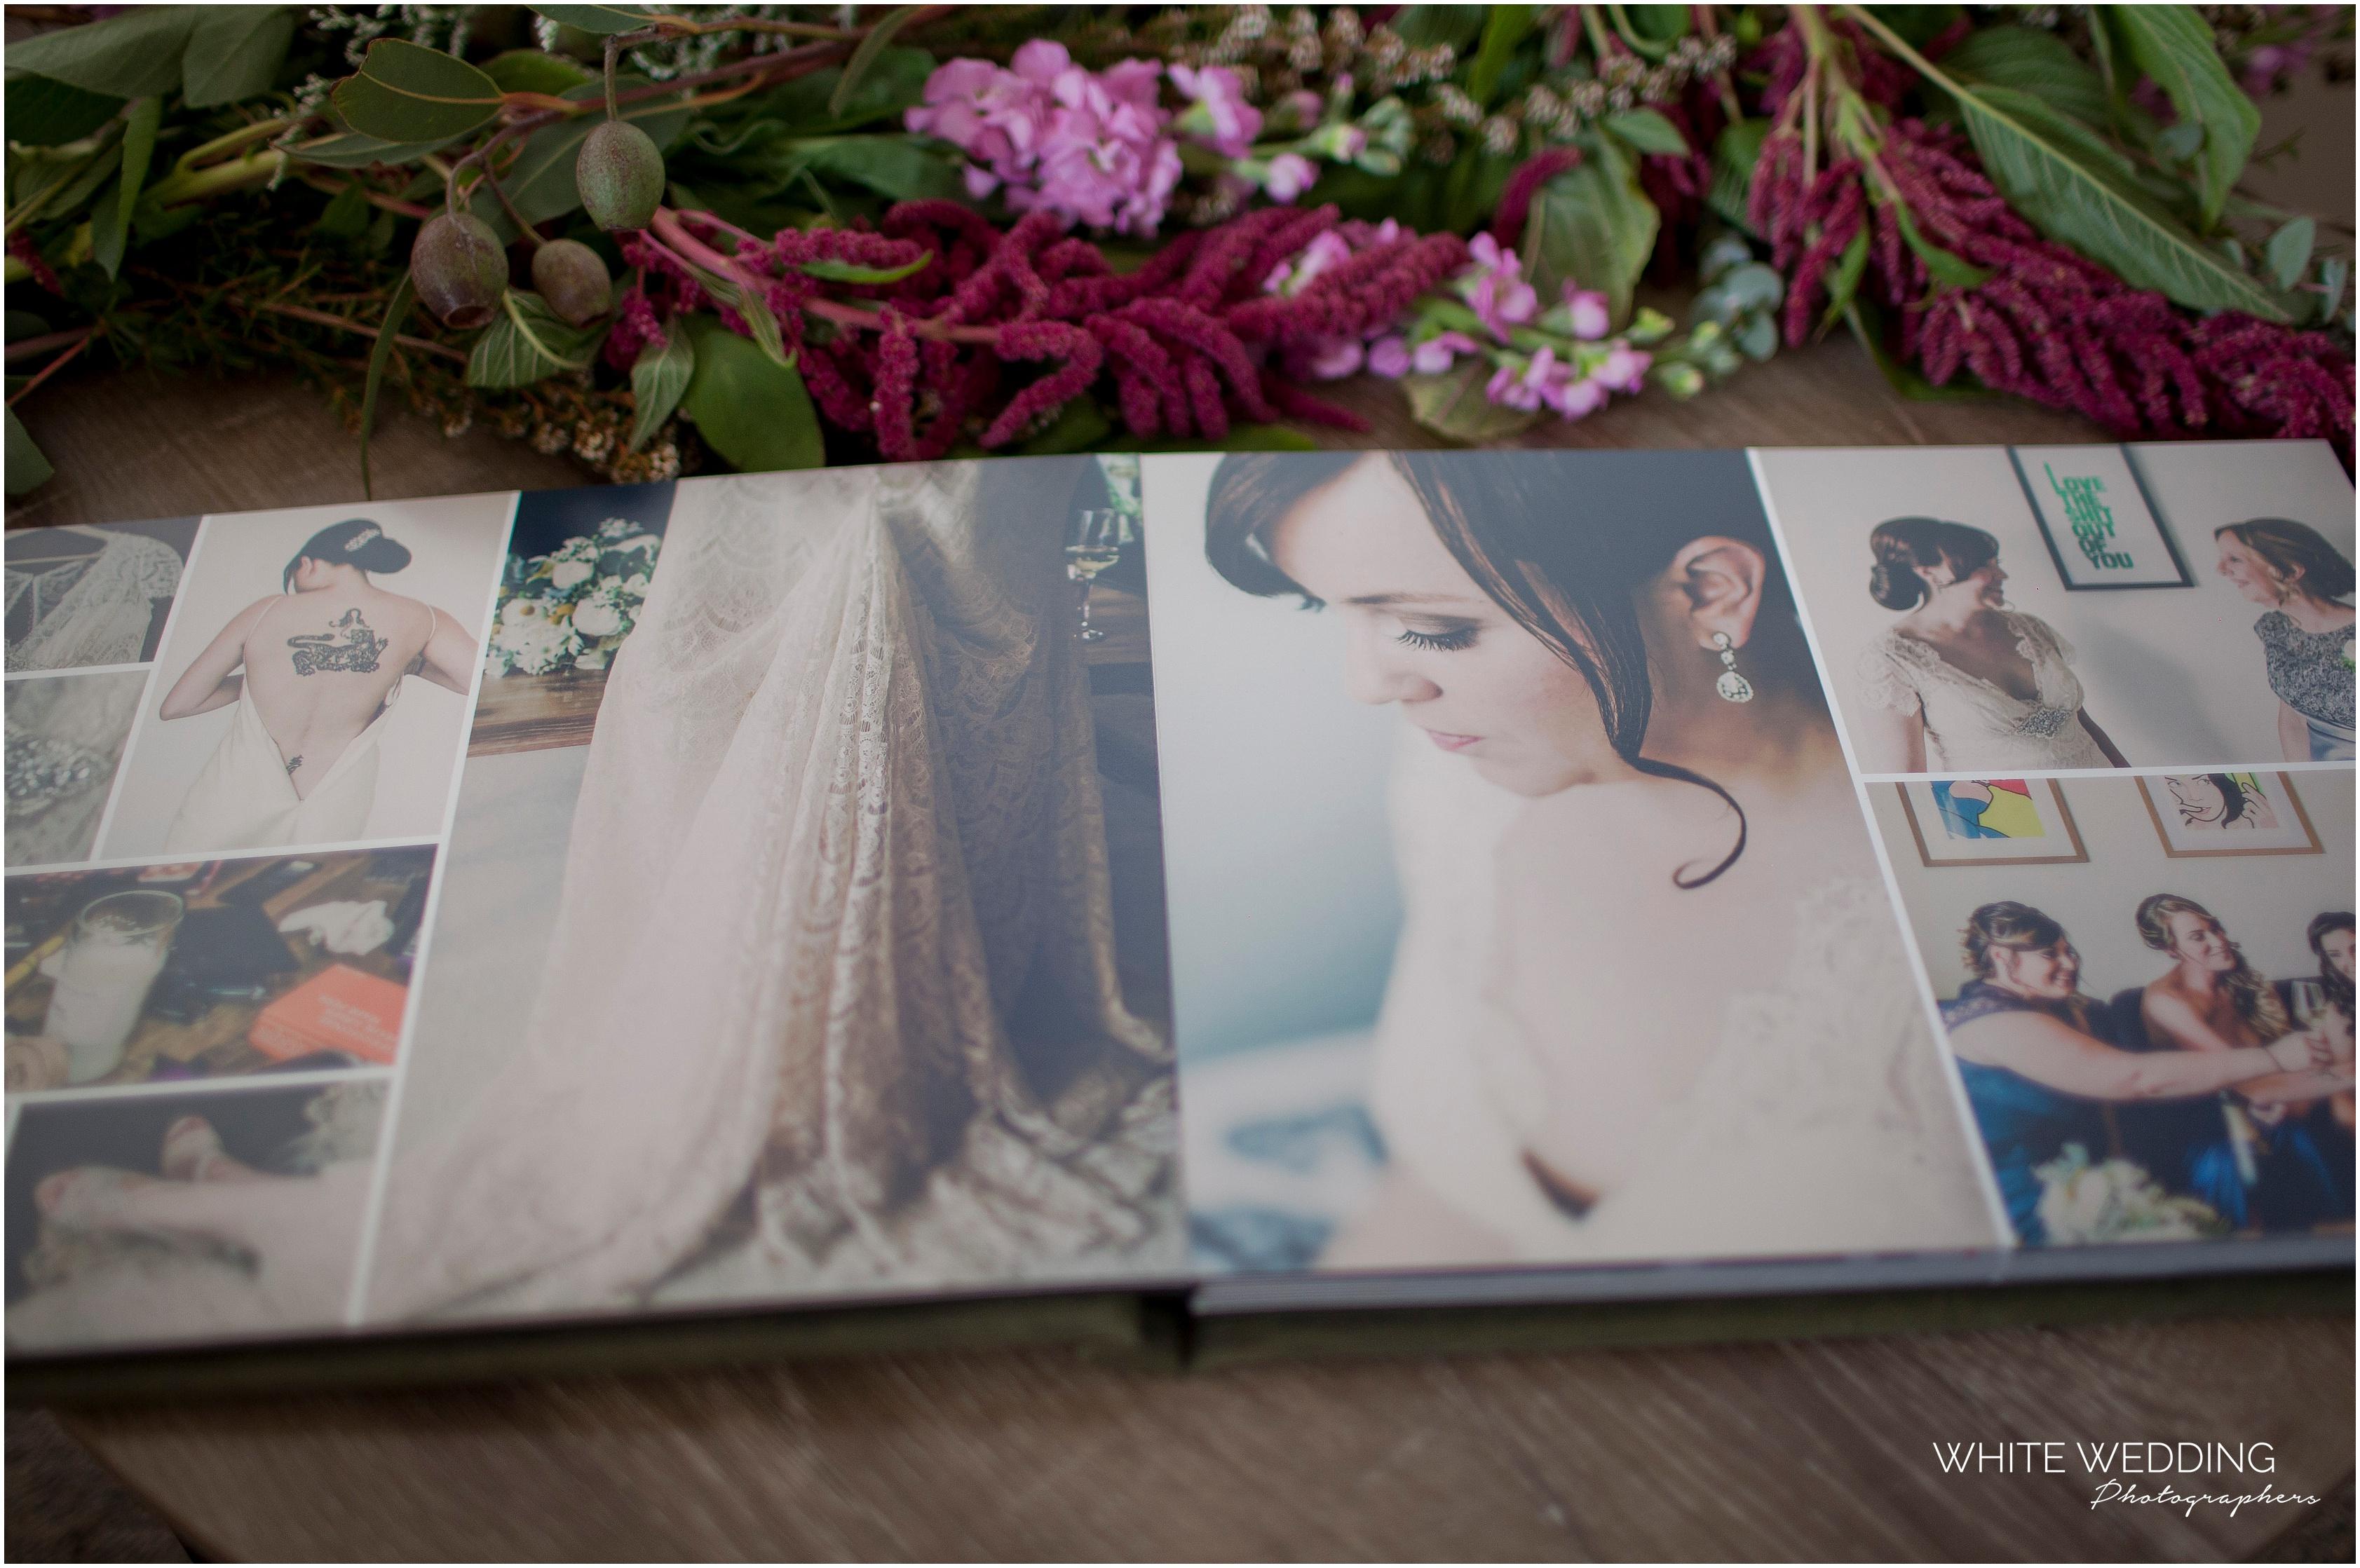 white-wedding-photographers-wedding-album-photo_4660.jpg